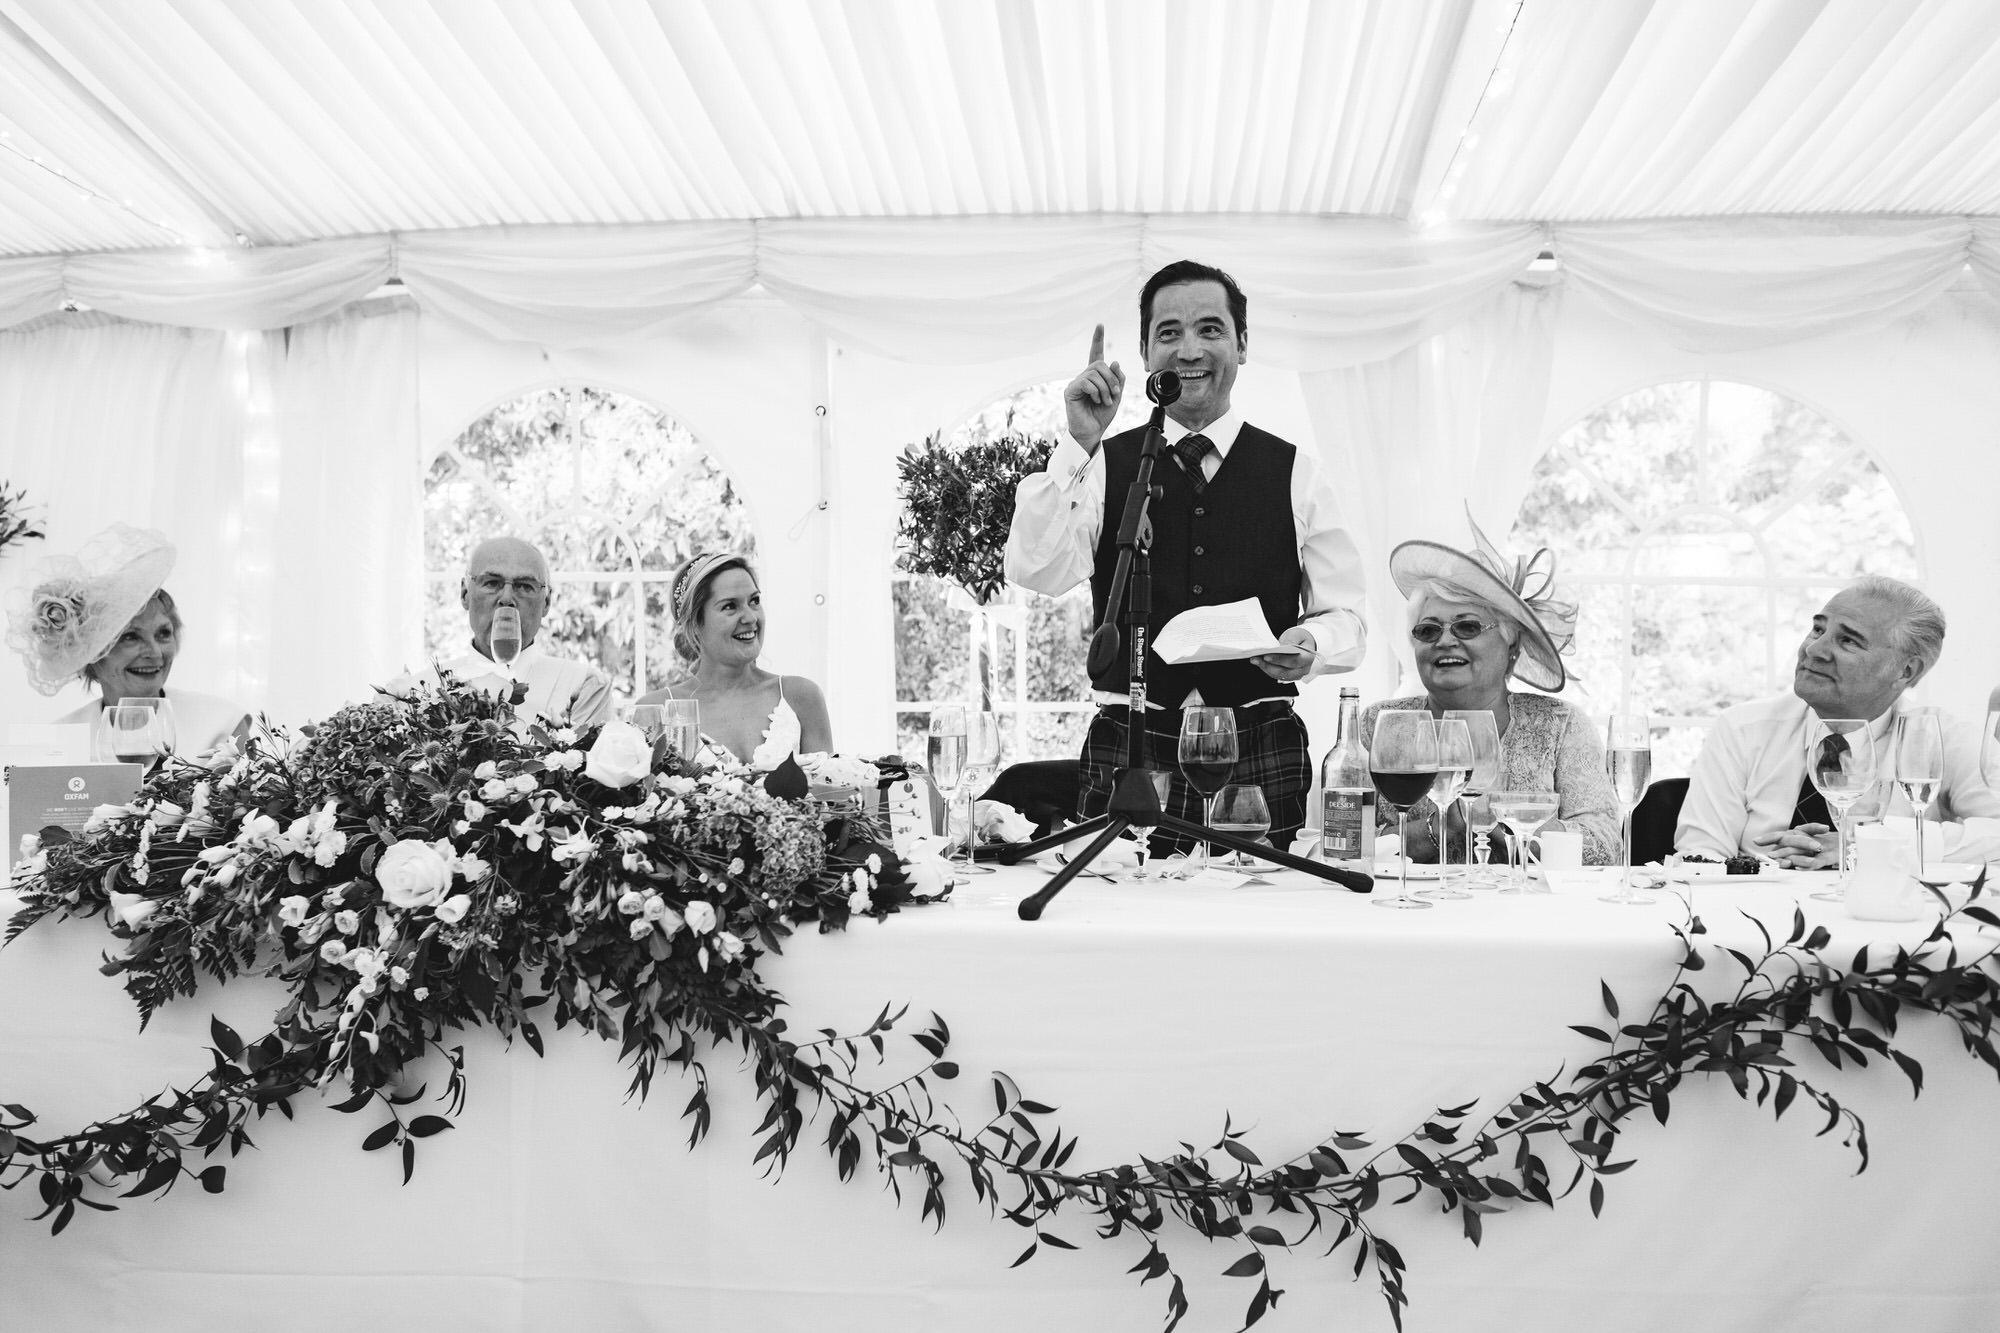 Dorset marquee wedding by the sea simon biffen photography 44